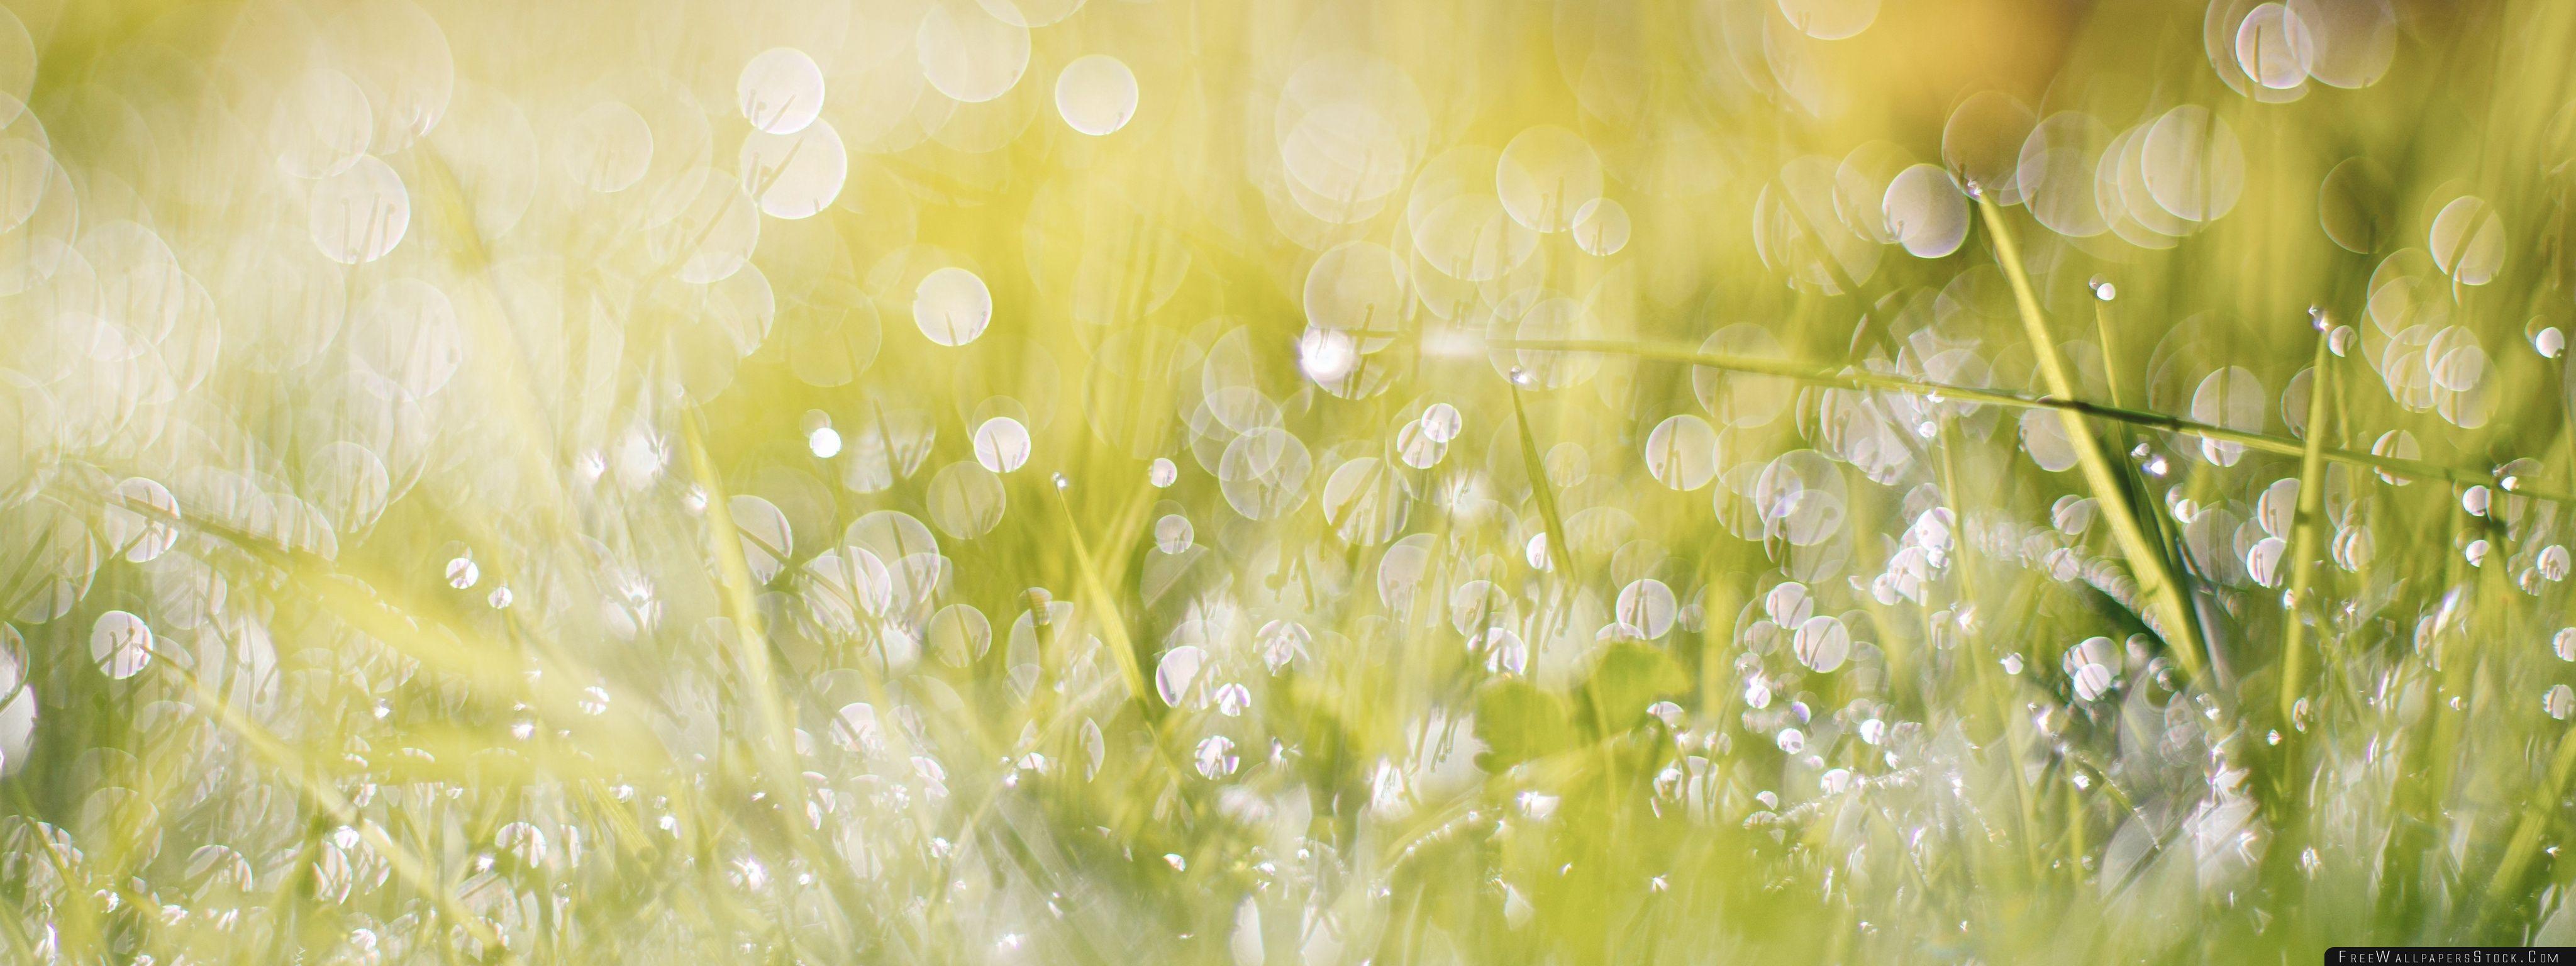 Download Free Wallpaper Wet Grass Bokeh